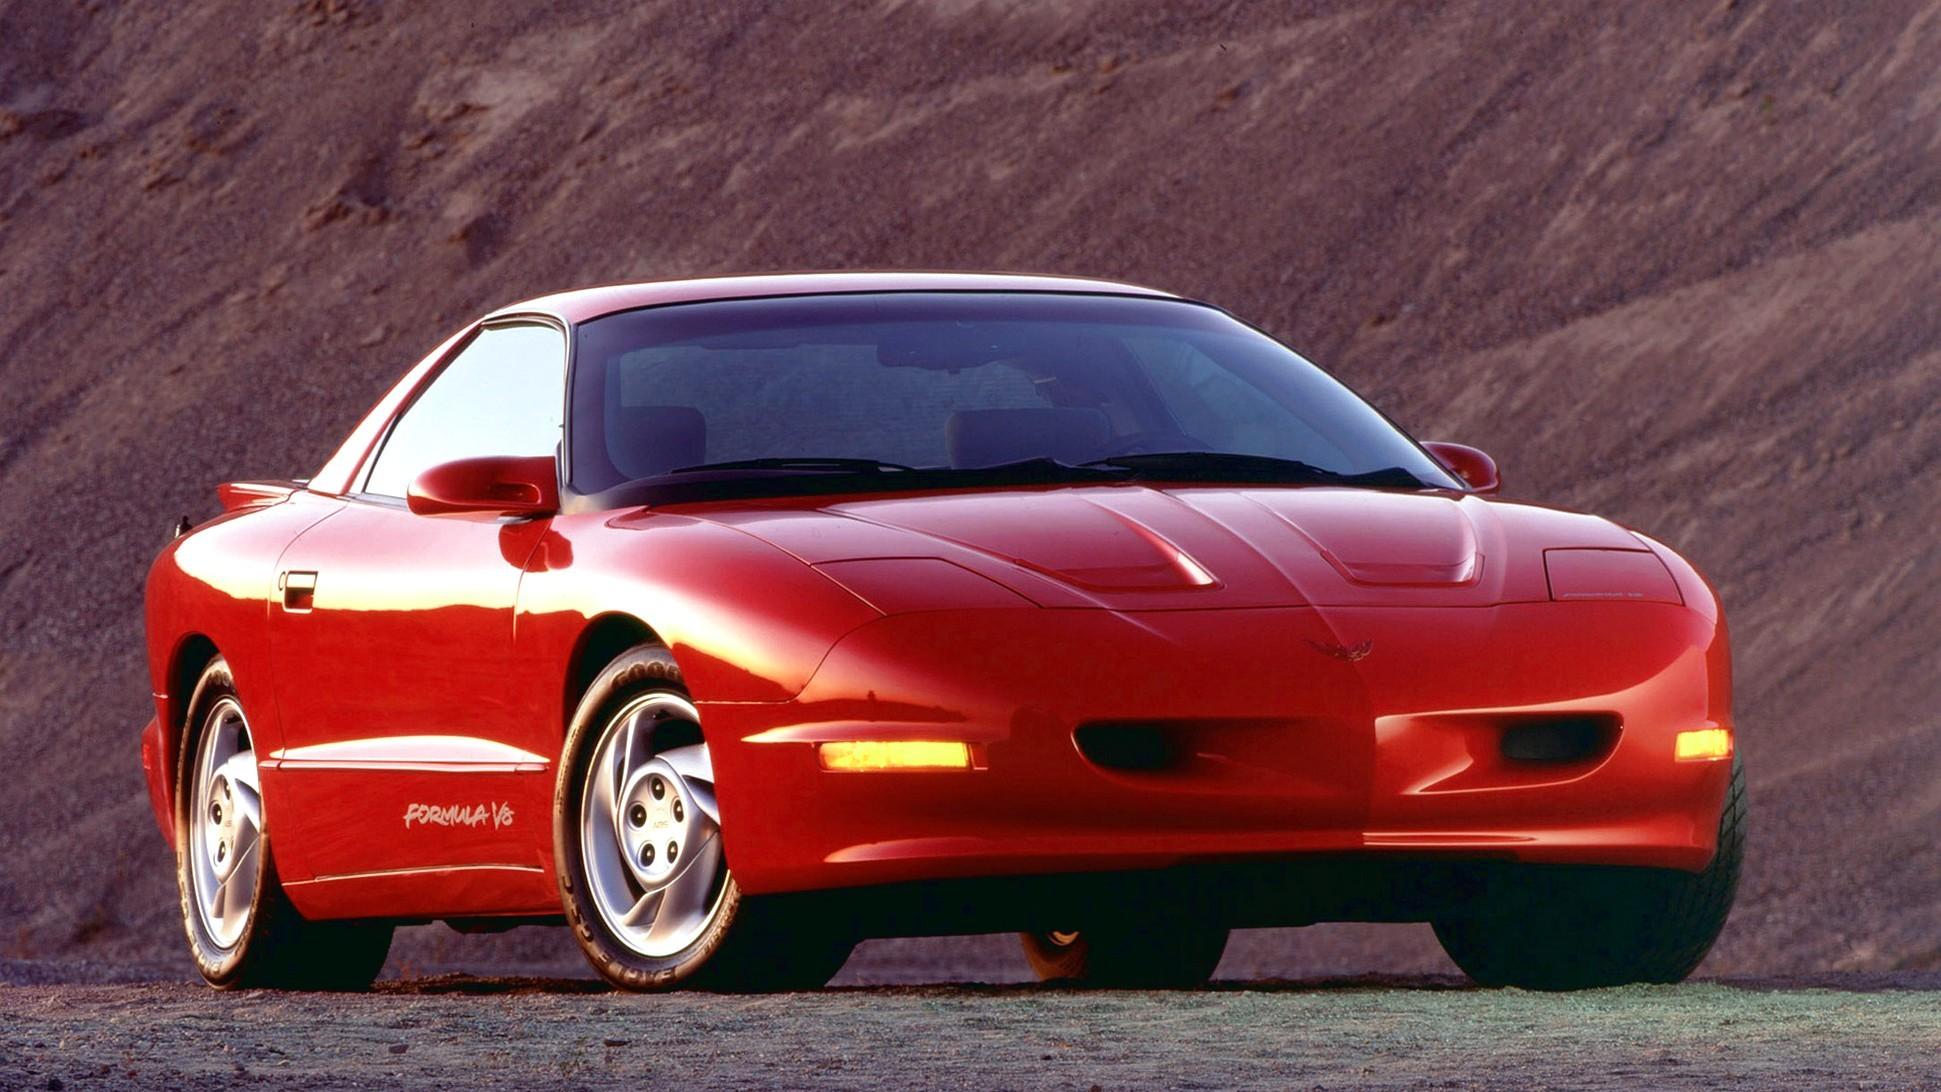 1996 Pontiac Firebird Formula V2 Hd Car Wallpaper